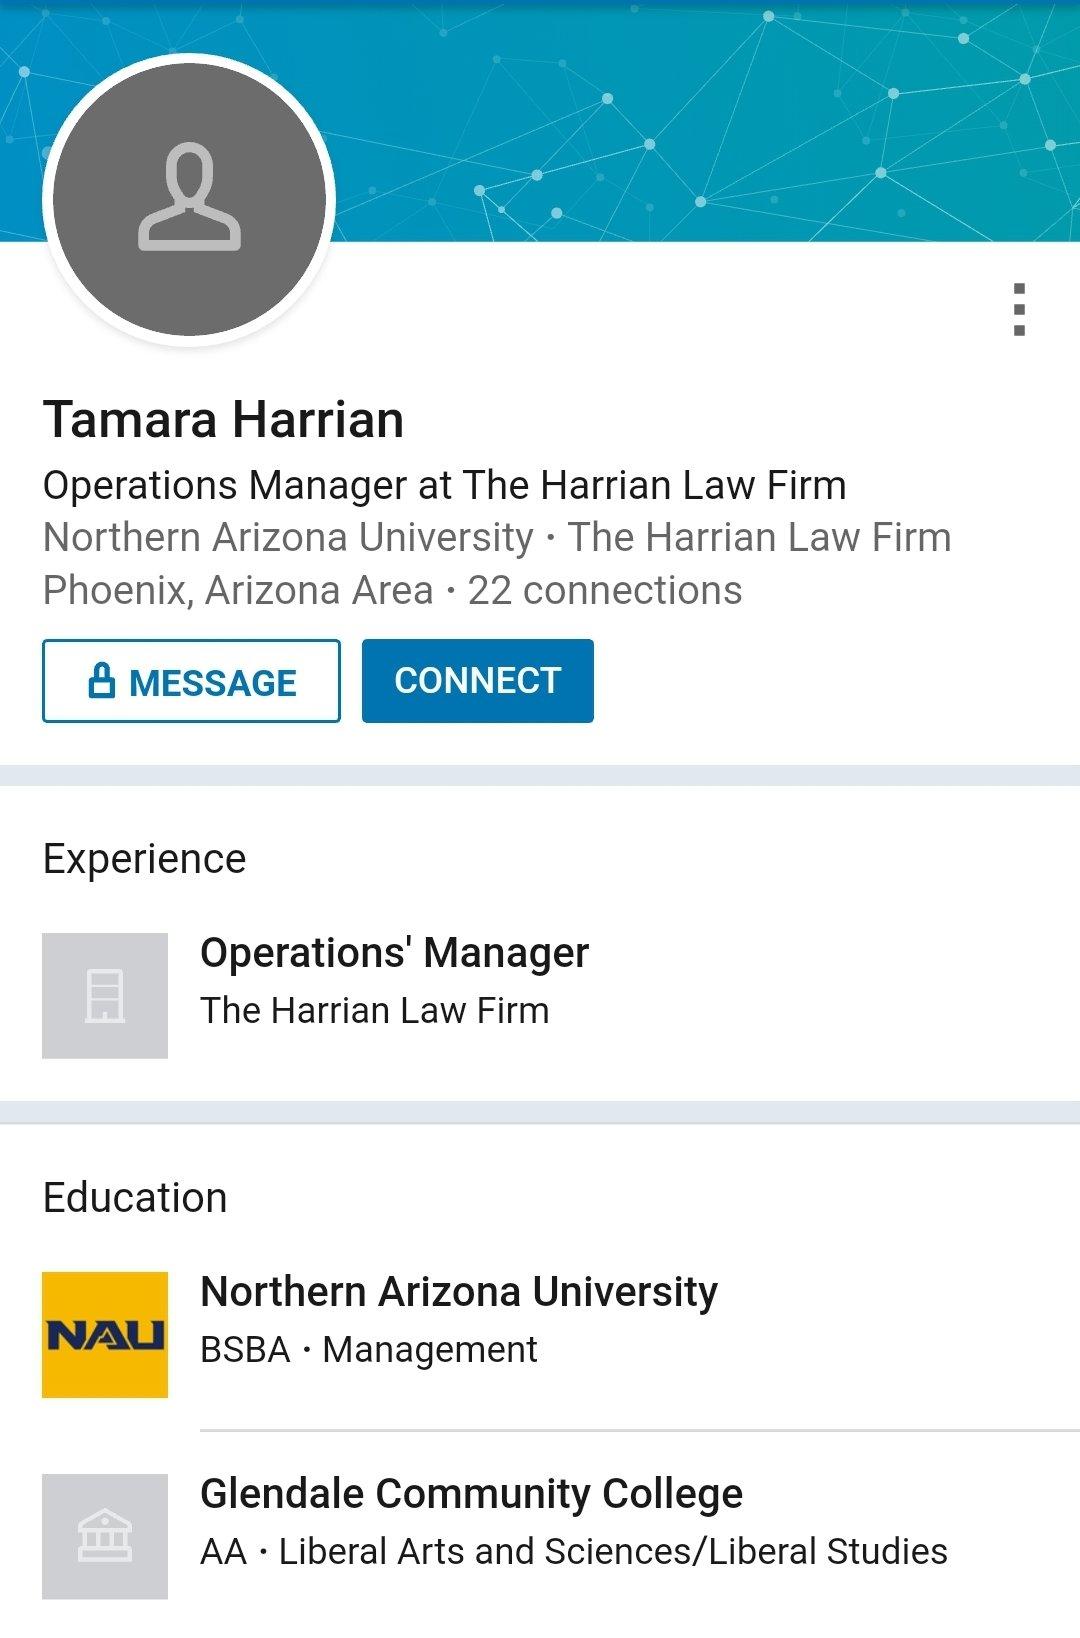 Tamara Harrian LinkedIn